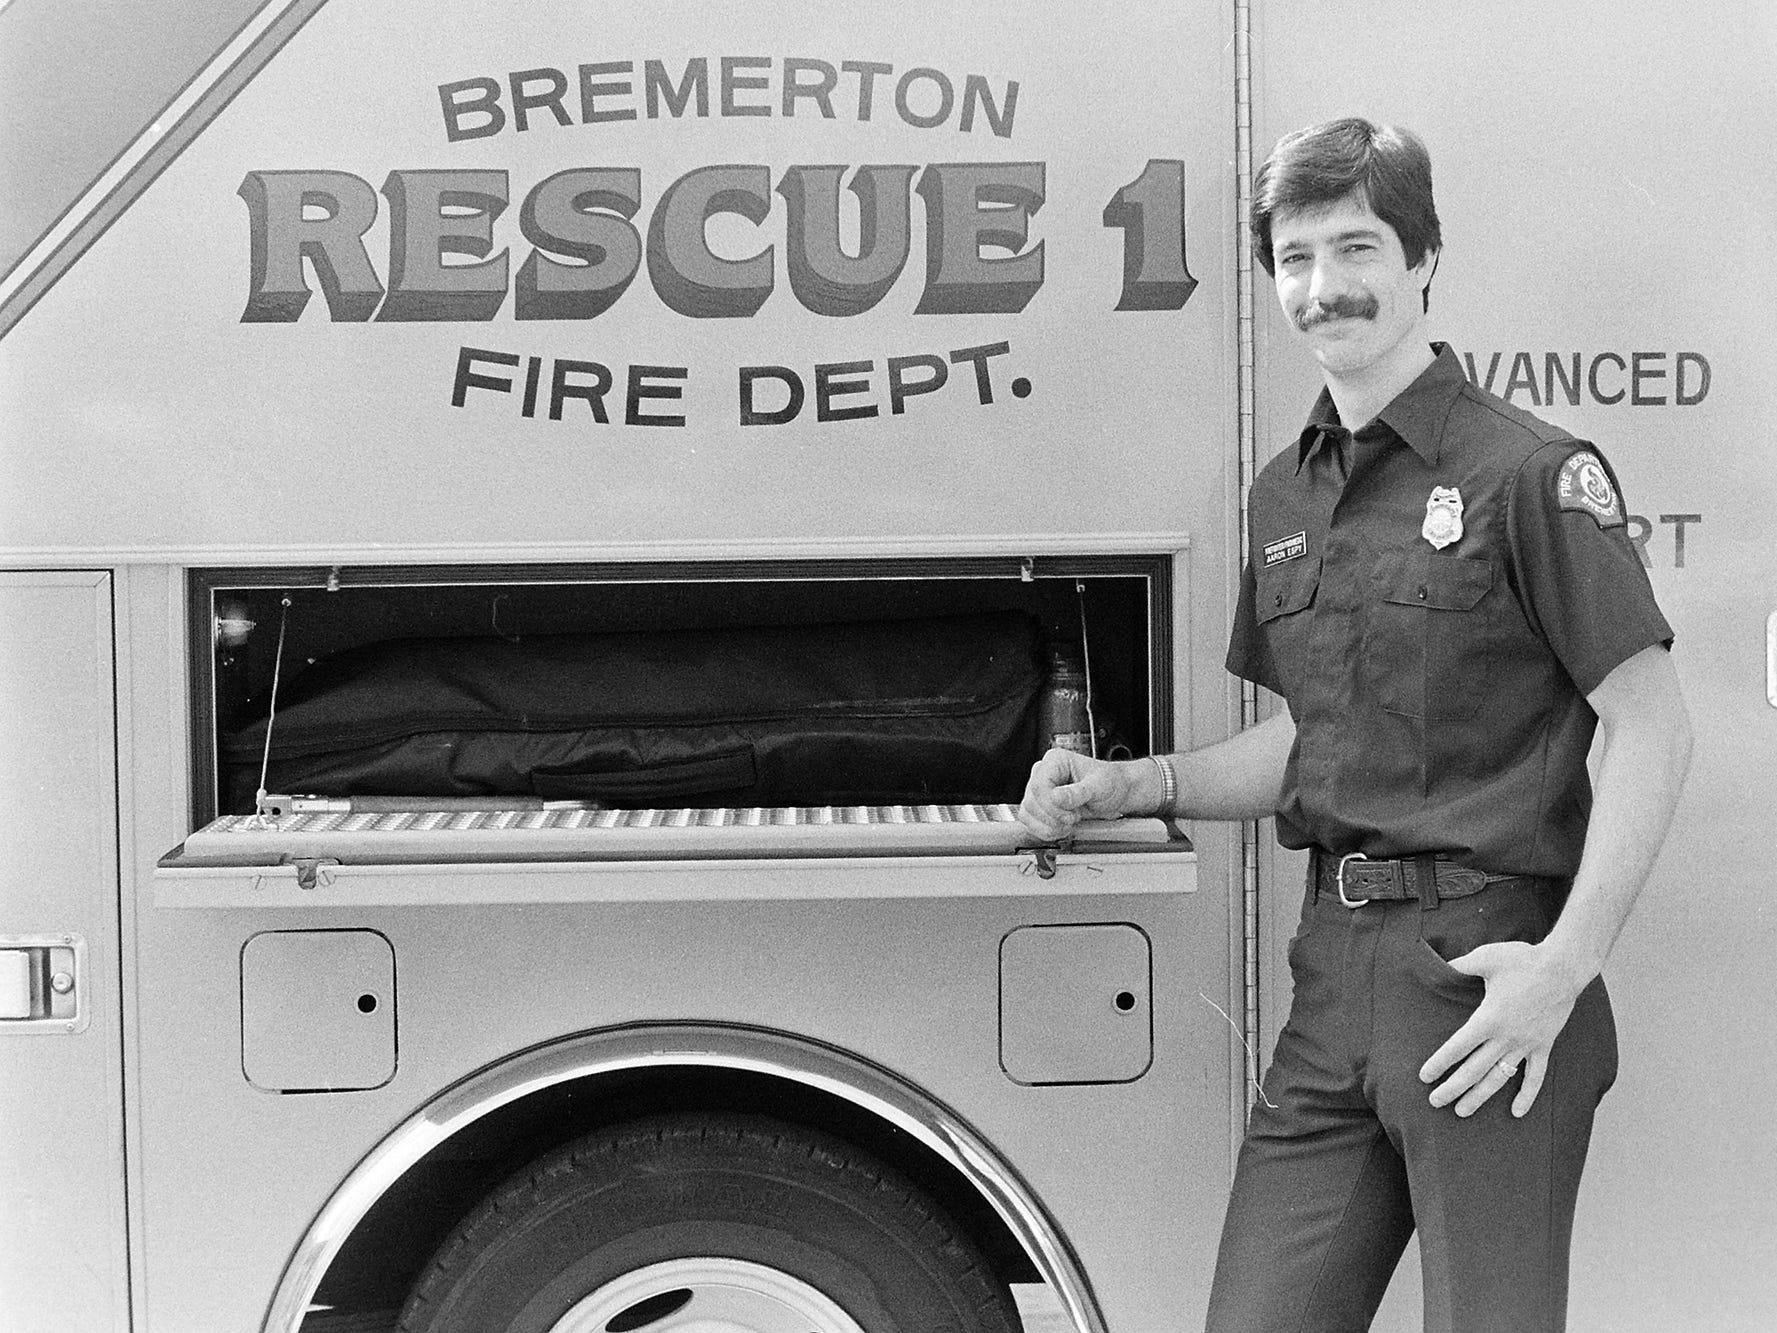 04/20/84New Bremerton Paramedic